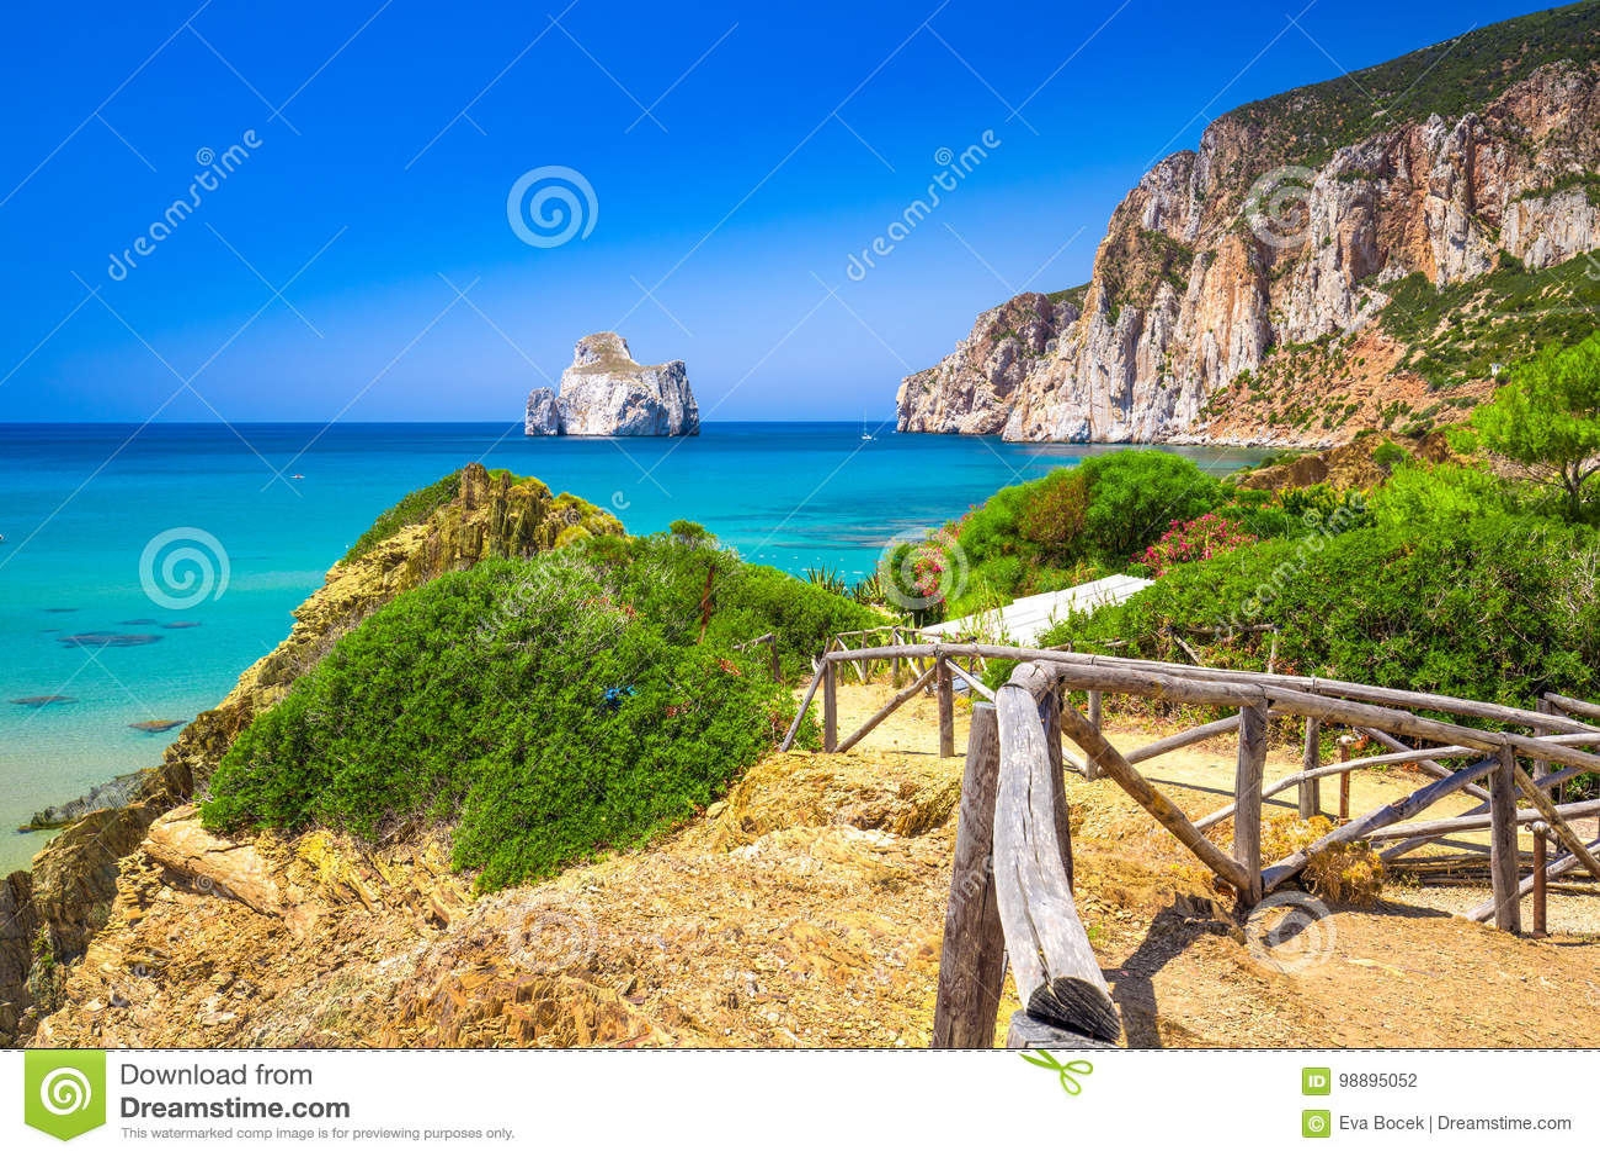 Spaggia Di Masua παραλία και Pan Di Τσούκερο, πλευρά Verde, Σαρδηνία, Ιταλία